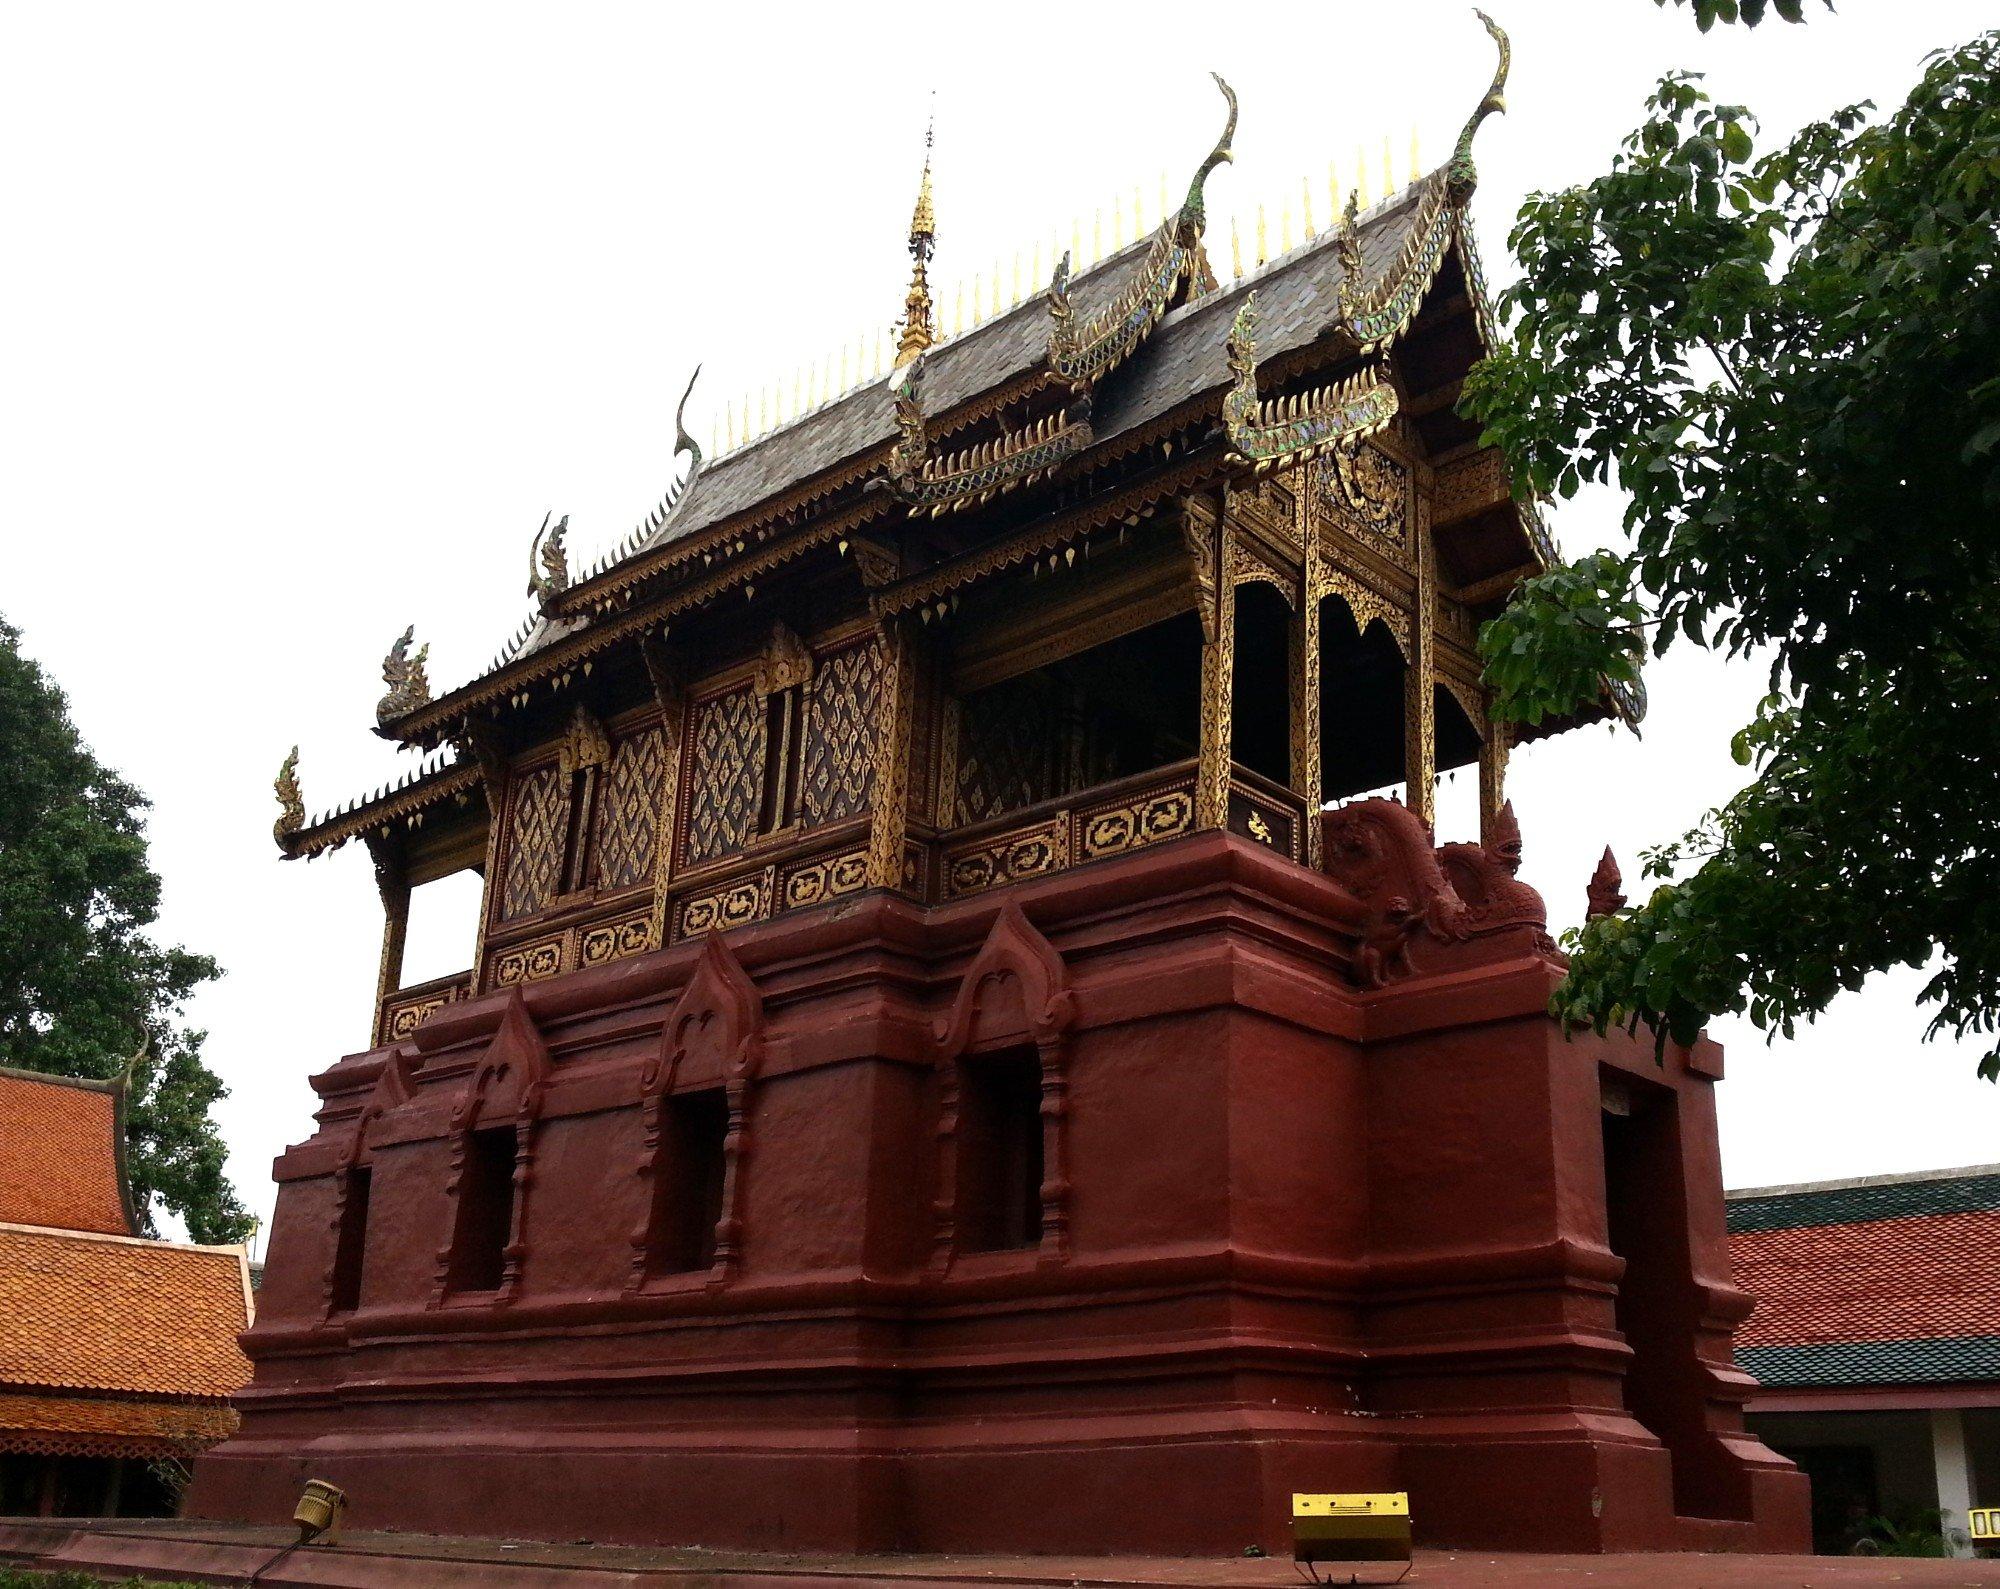 Library at Wat Phra That Hariphunchai